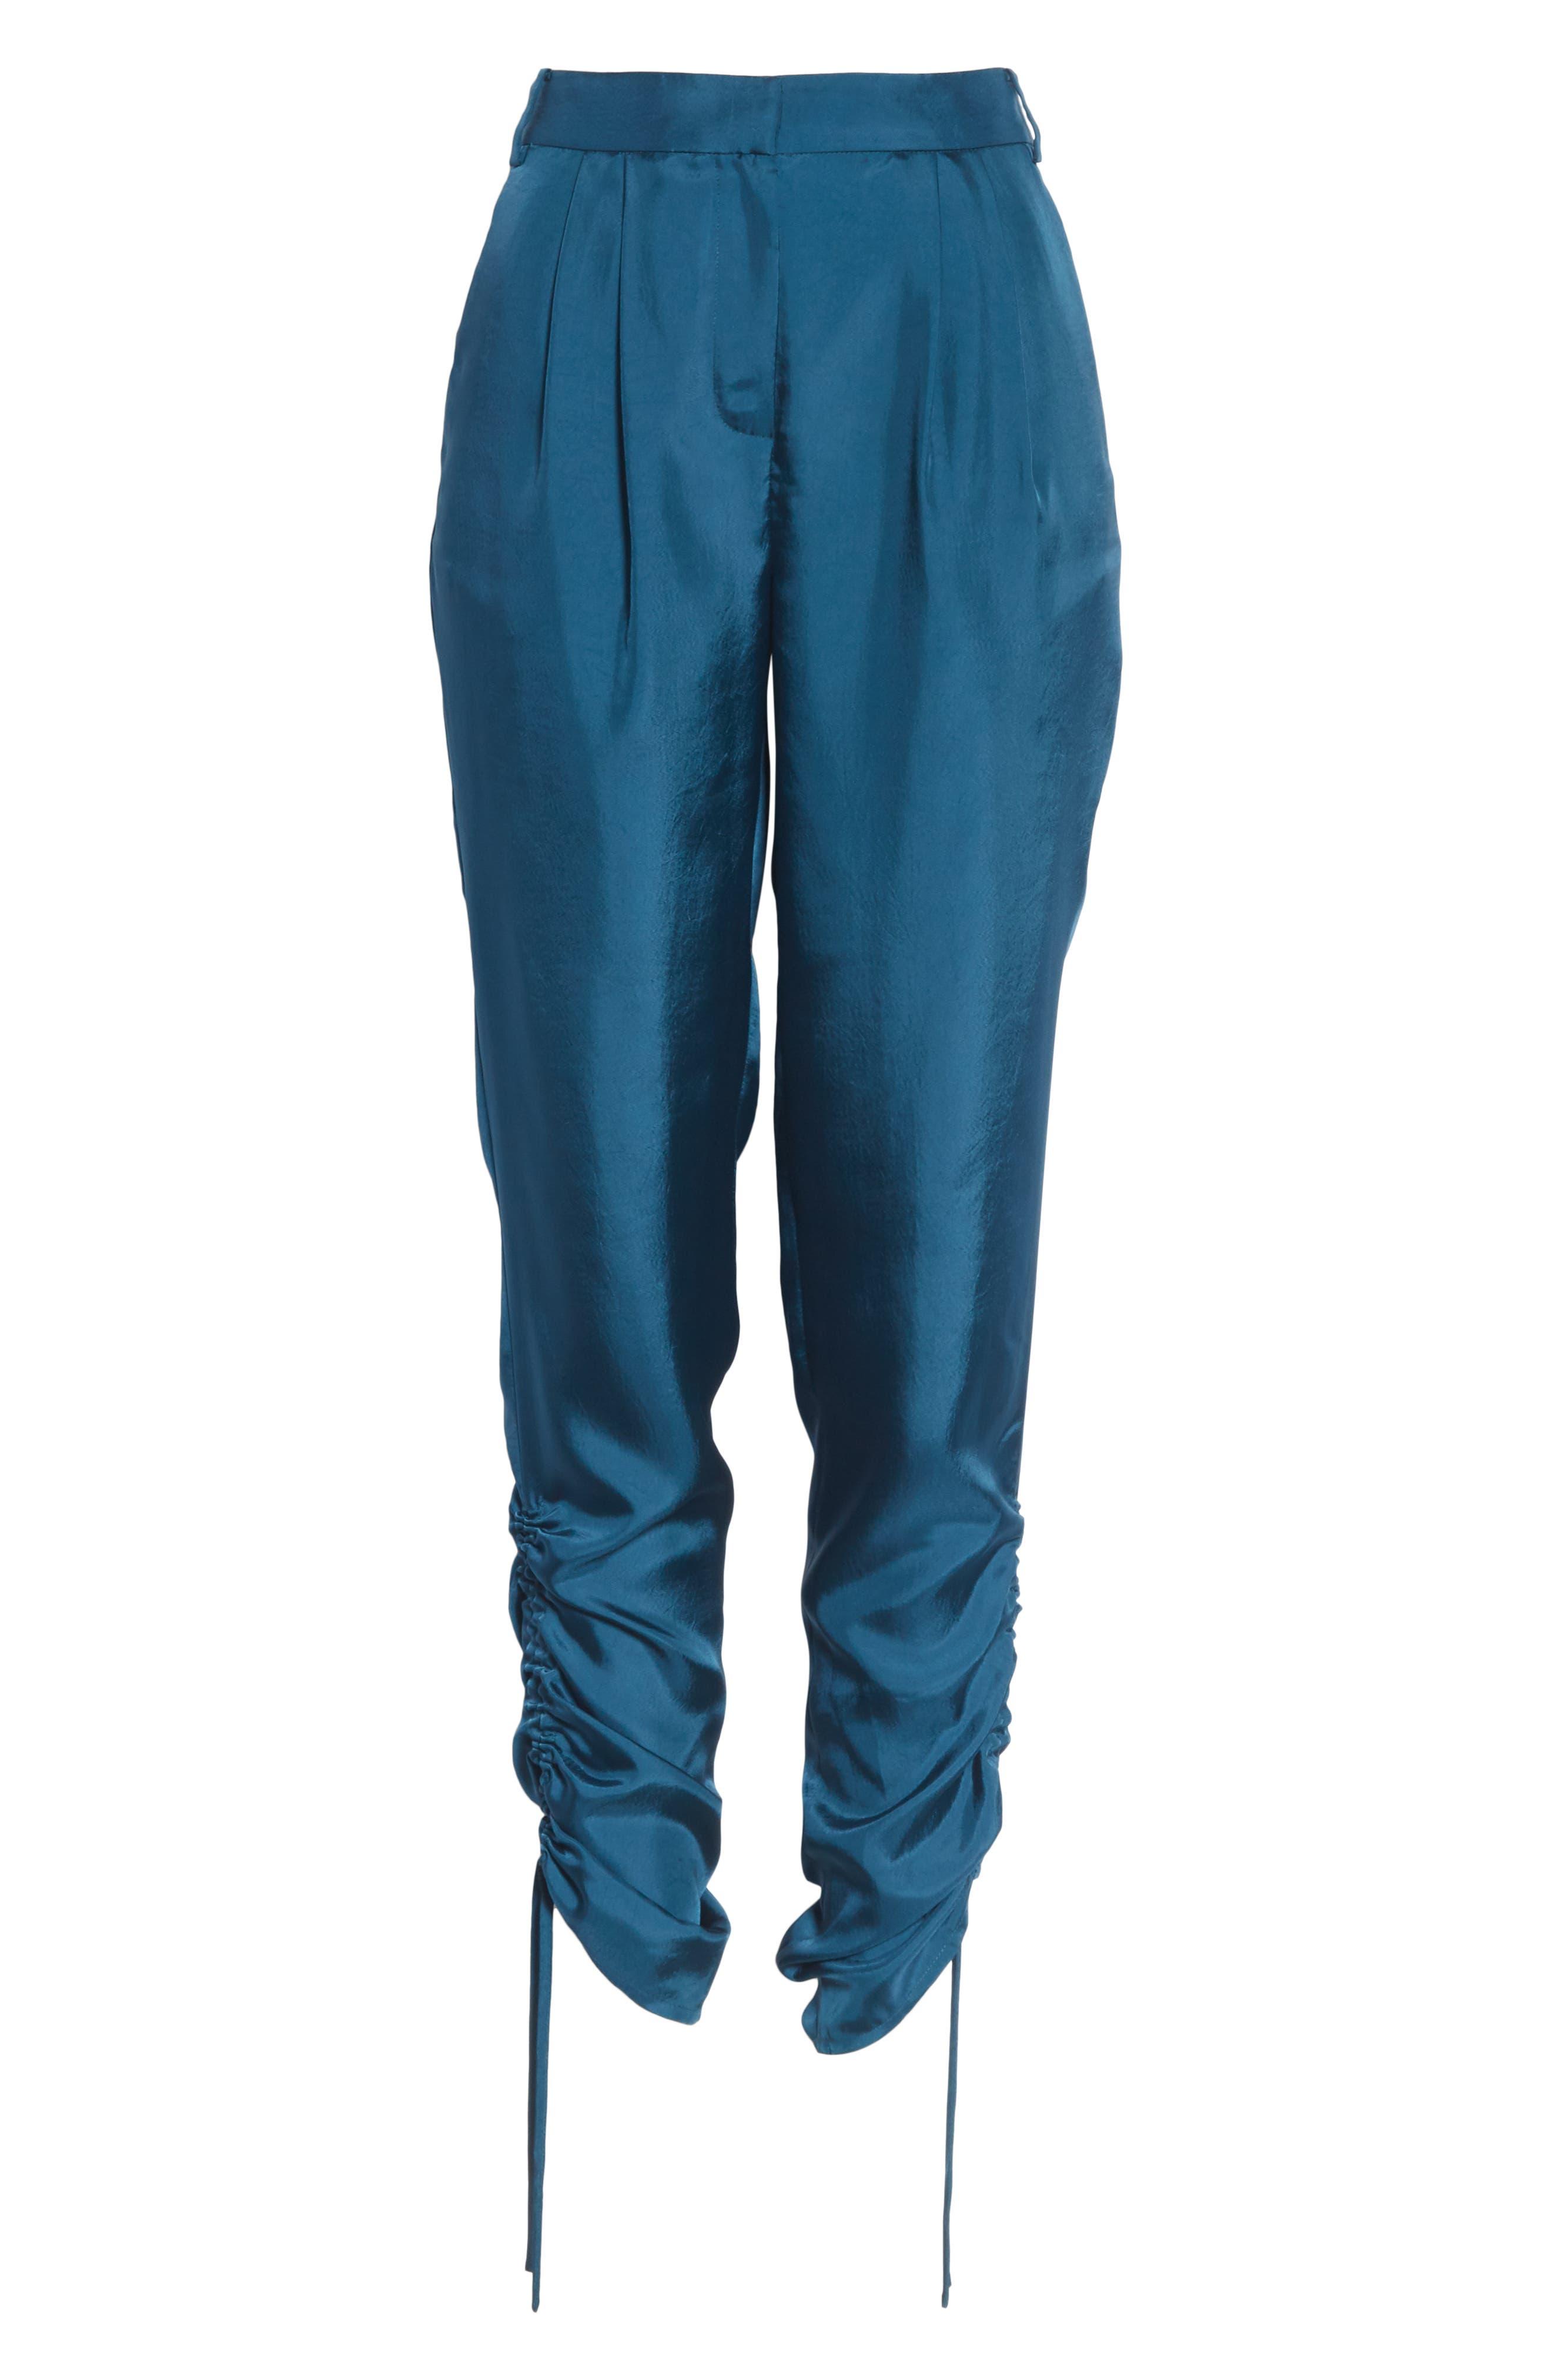 Mendini Twill Shirred Pants,                             Alternate thumbnail 6, color,                             TEAL BLUE